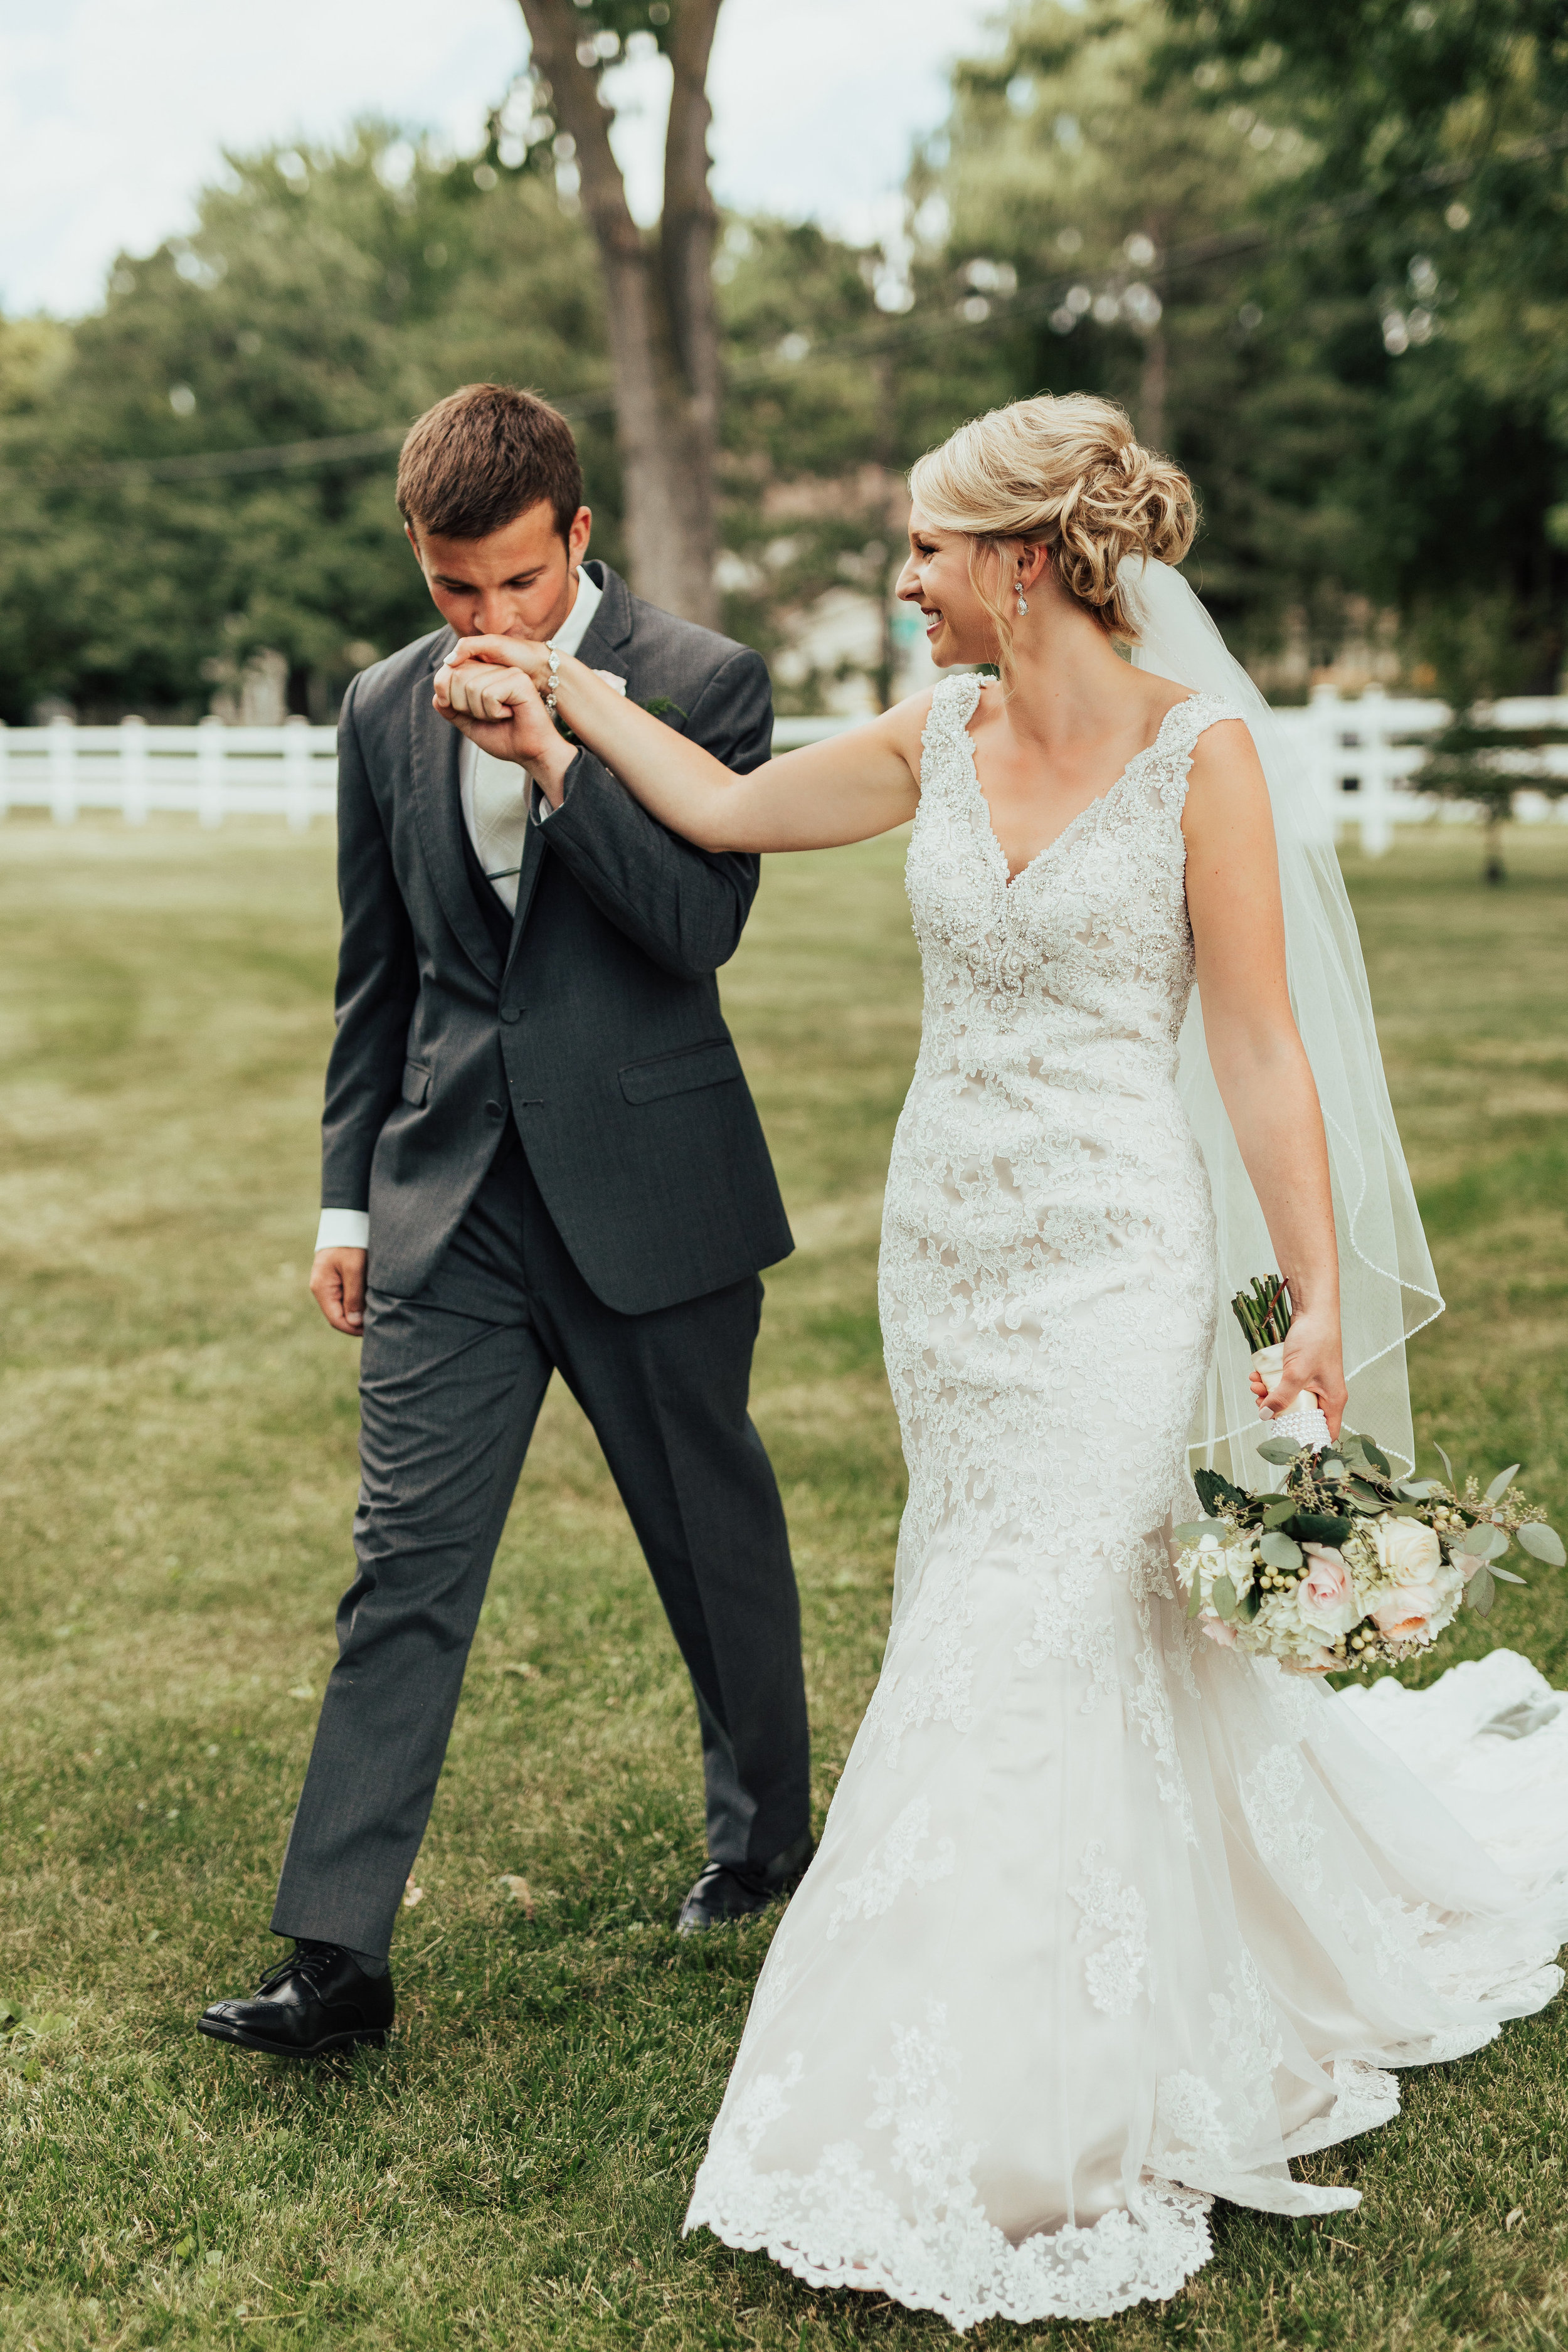 Janelle Elise | Megan + Corey | Furber Farm | Sixpence Events | A Vintage Touch Weddings64.jpg